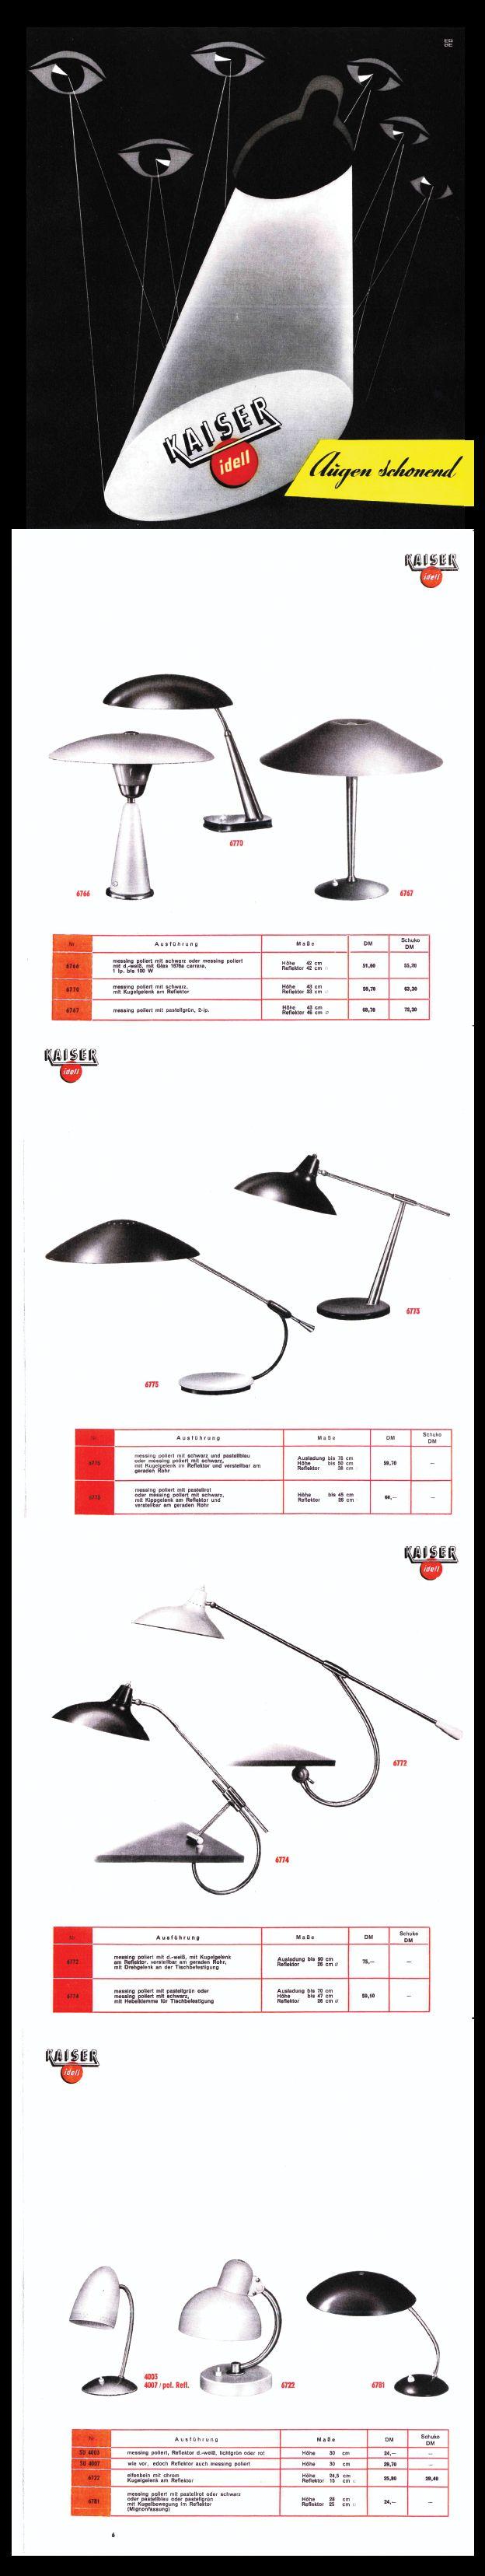 Rare Kaiser & Co. Work Lamp Catalogue 1955 - #KaiserIdell #Kaiser_Idell #ChristianDell #Bauhaus #Modernism #Modernist #Molecula #arbeitslampen